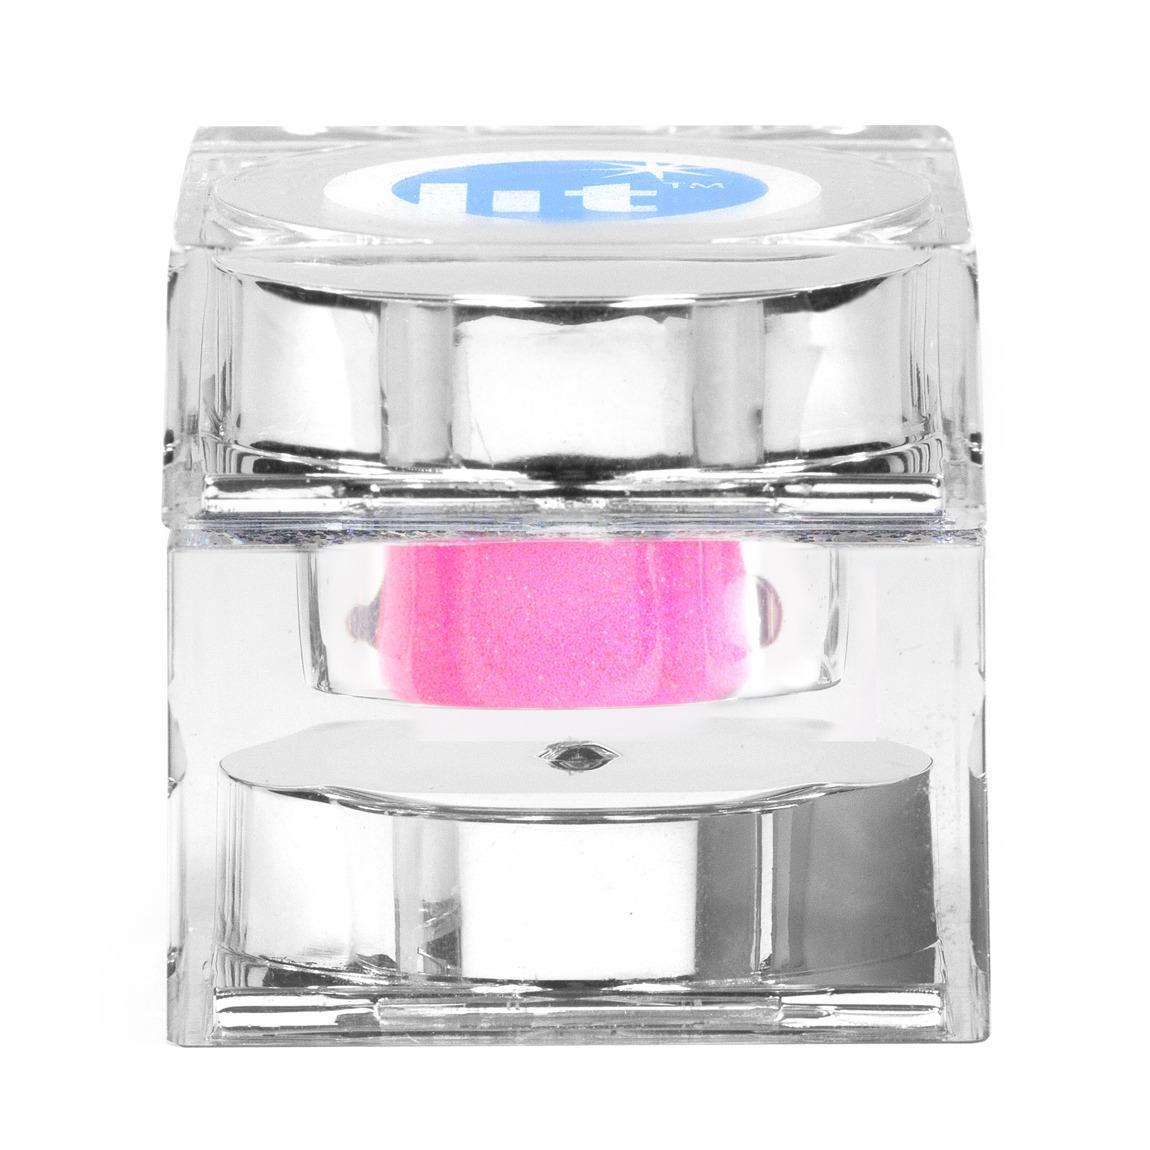 Lit Cosmetics Lit Glitter No Doubt (Electric) alternative view 1.